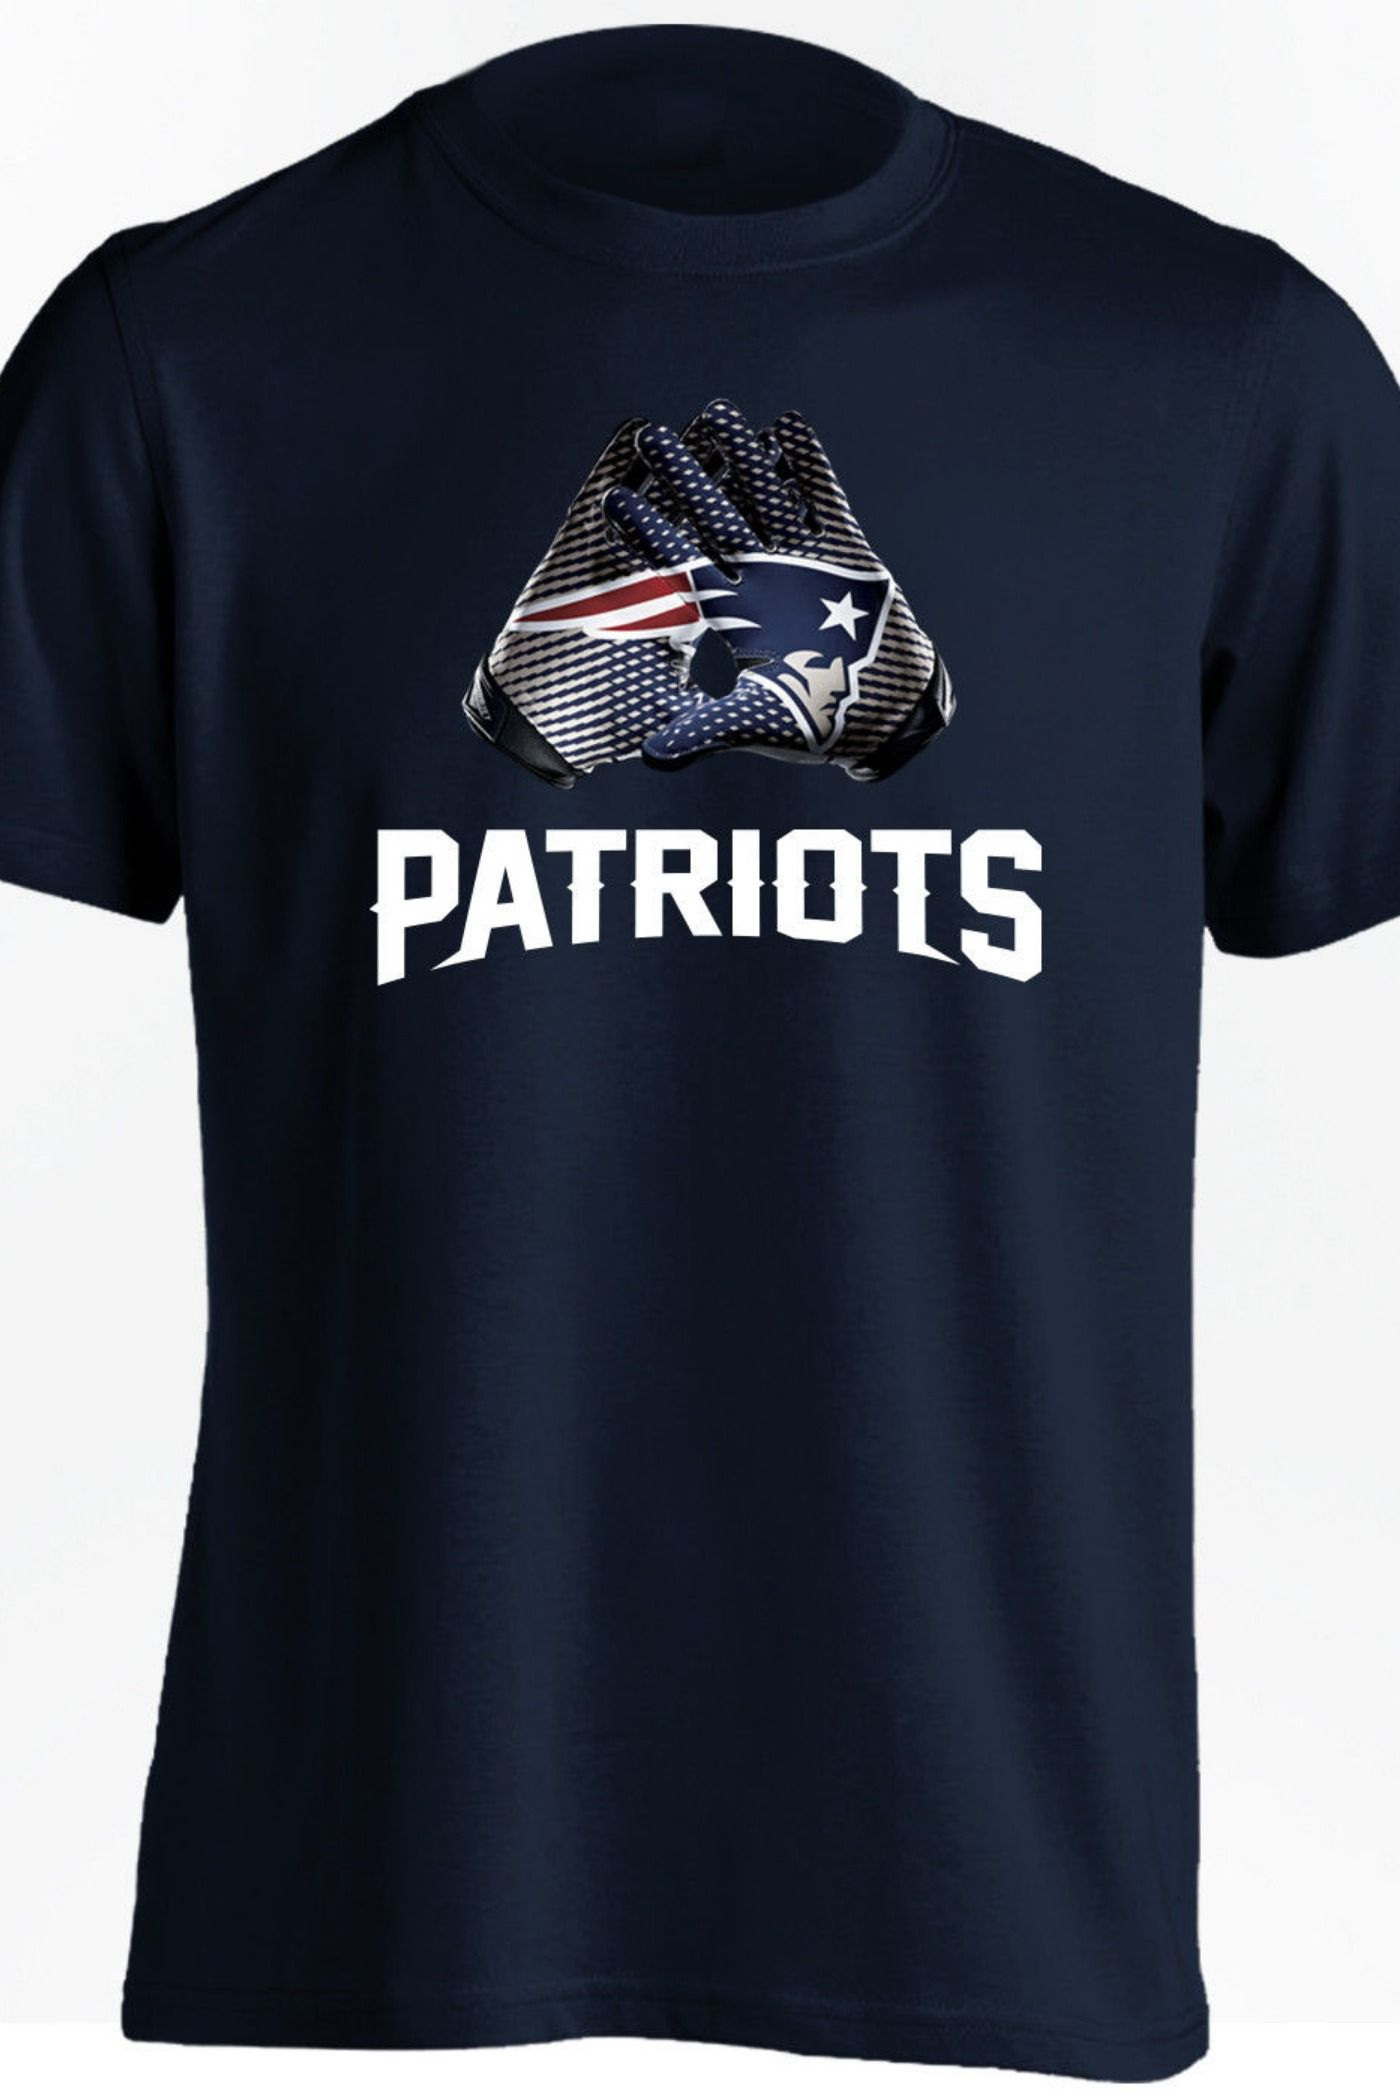 New England Patriots T Shirt Tom Brady Nfl Gloves Design Shirt S 5xl Tom Brady Nfl New England Patriots Tom Brady